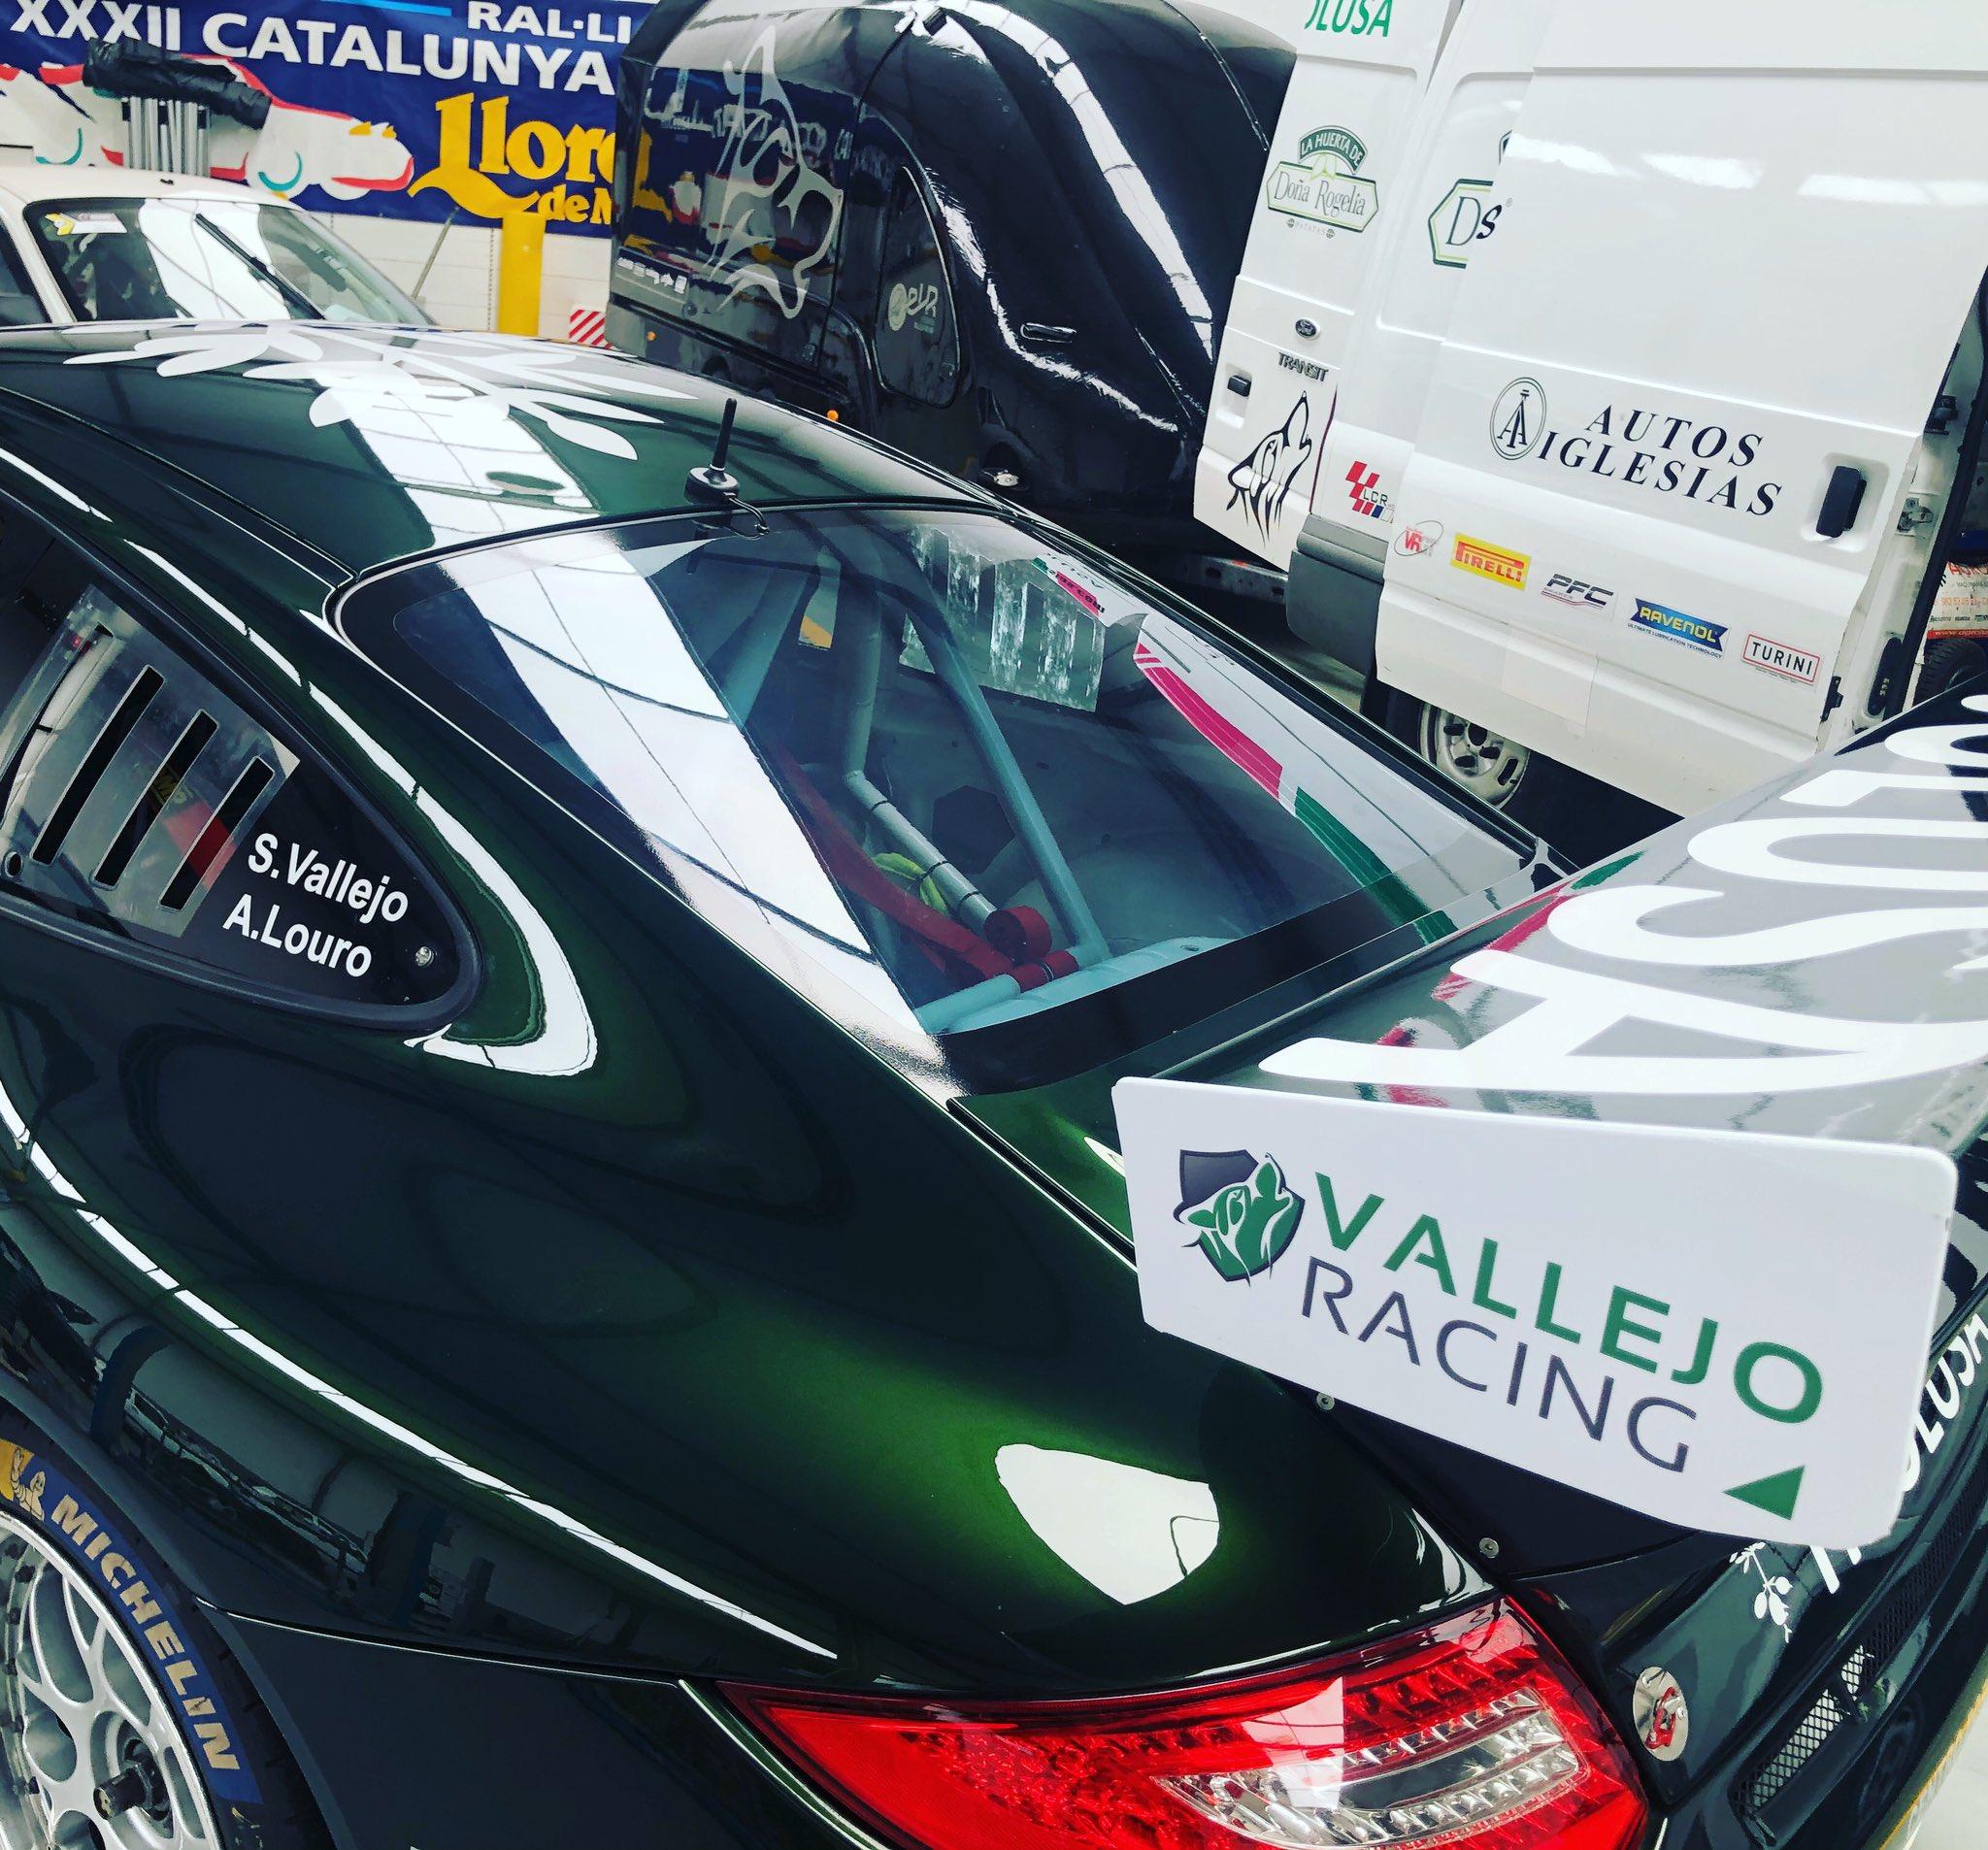 SCER + CERA + CERVH: 38º Rallye Sierra Morena - Internacional [8-10 Abril] Ex44kW6W8AIrosT?format=jpg&name=large